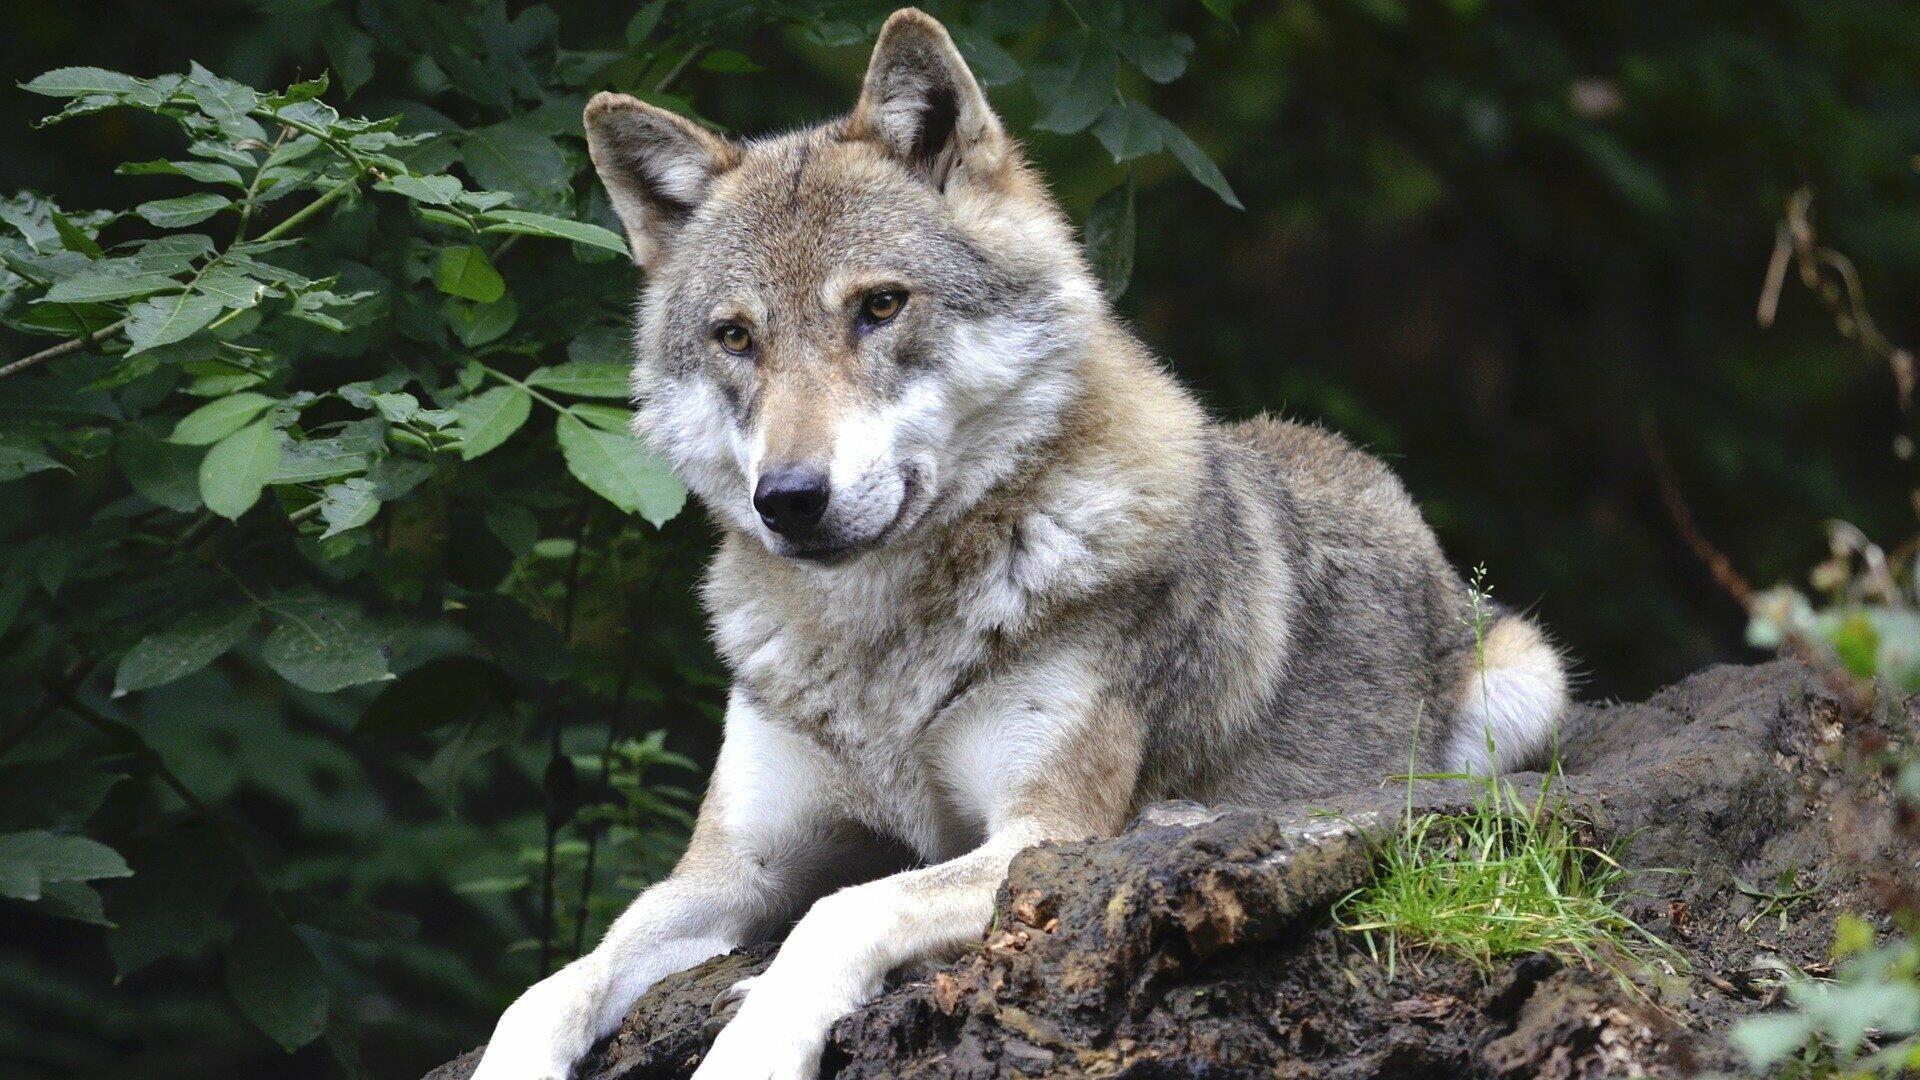 Wolf (Symbolbild) - SNA, 1920, 08.10.2021